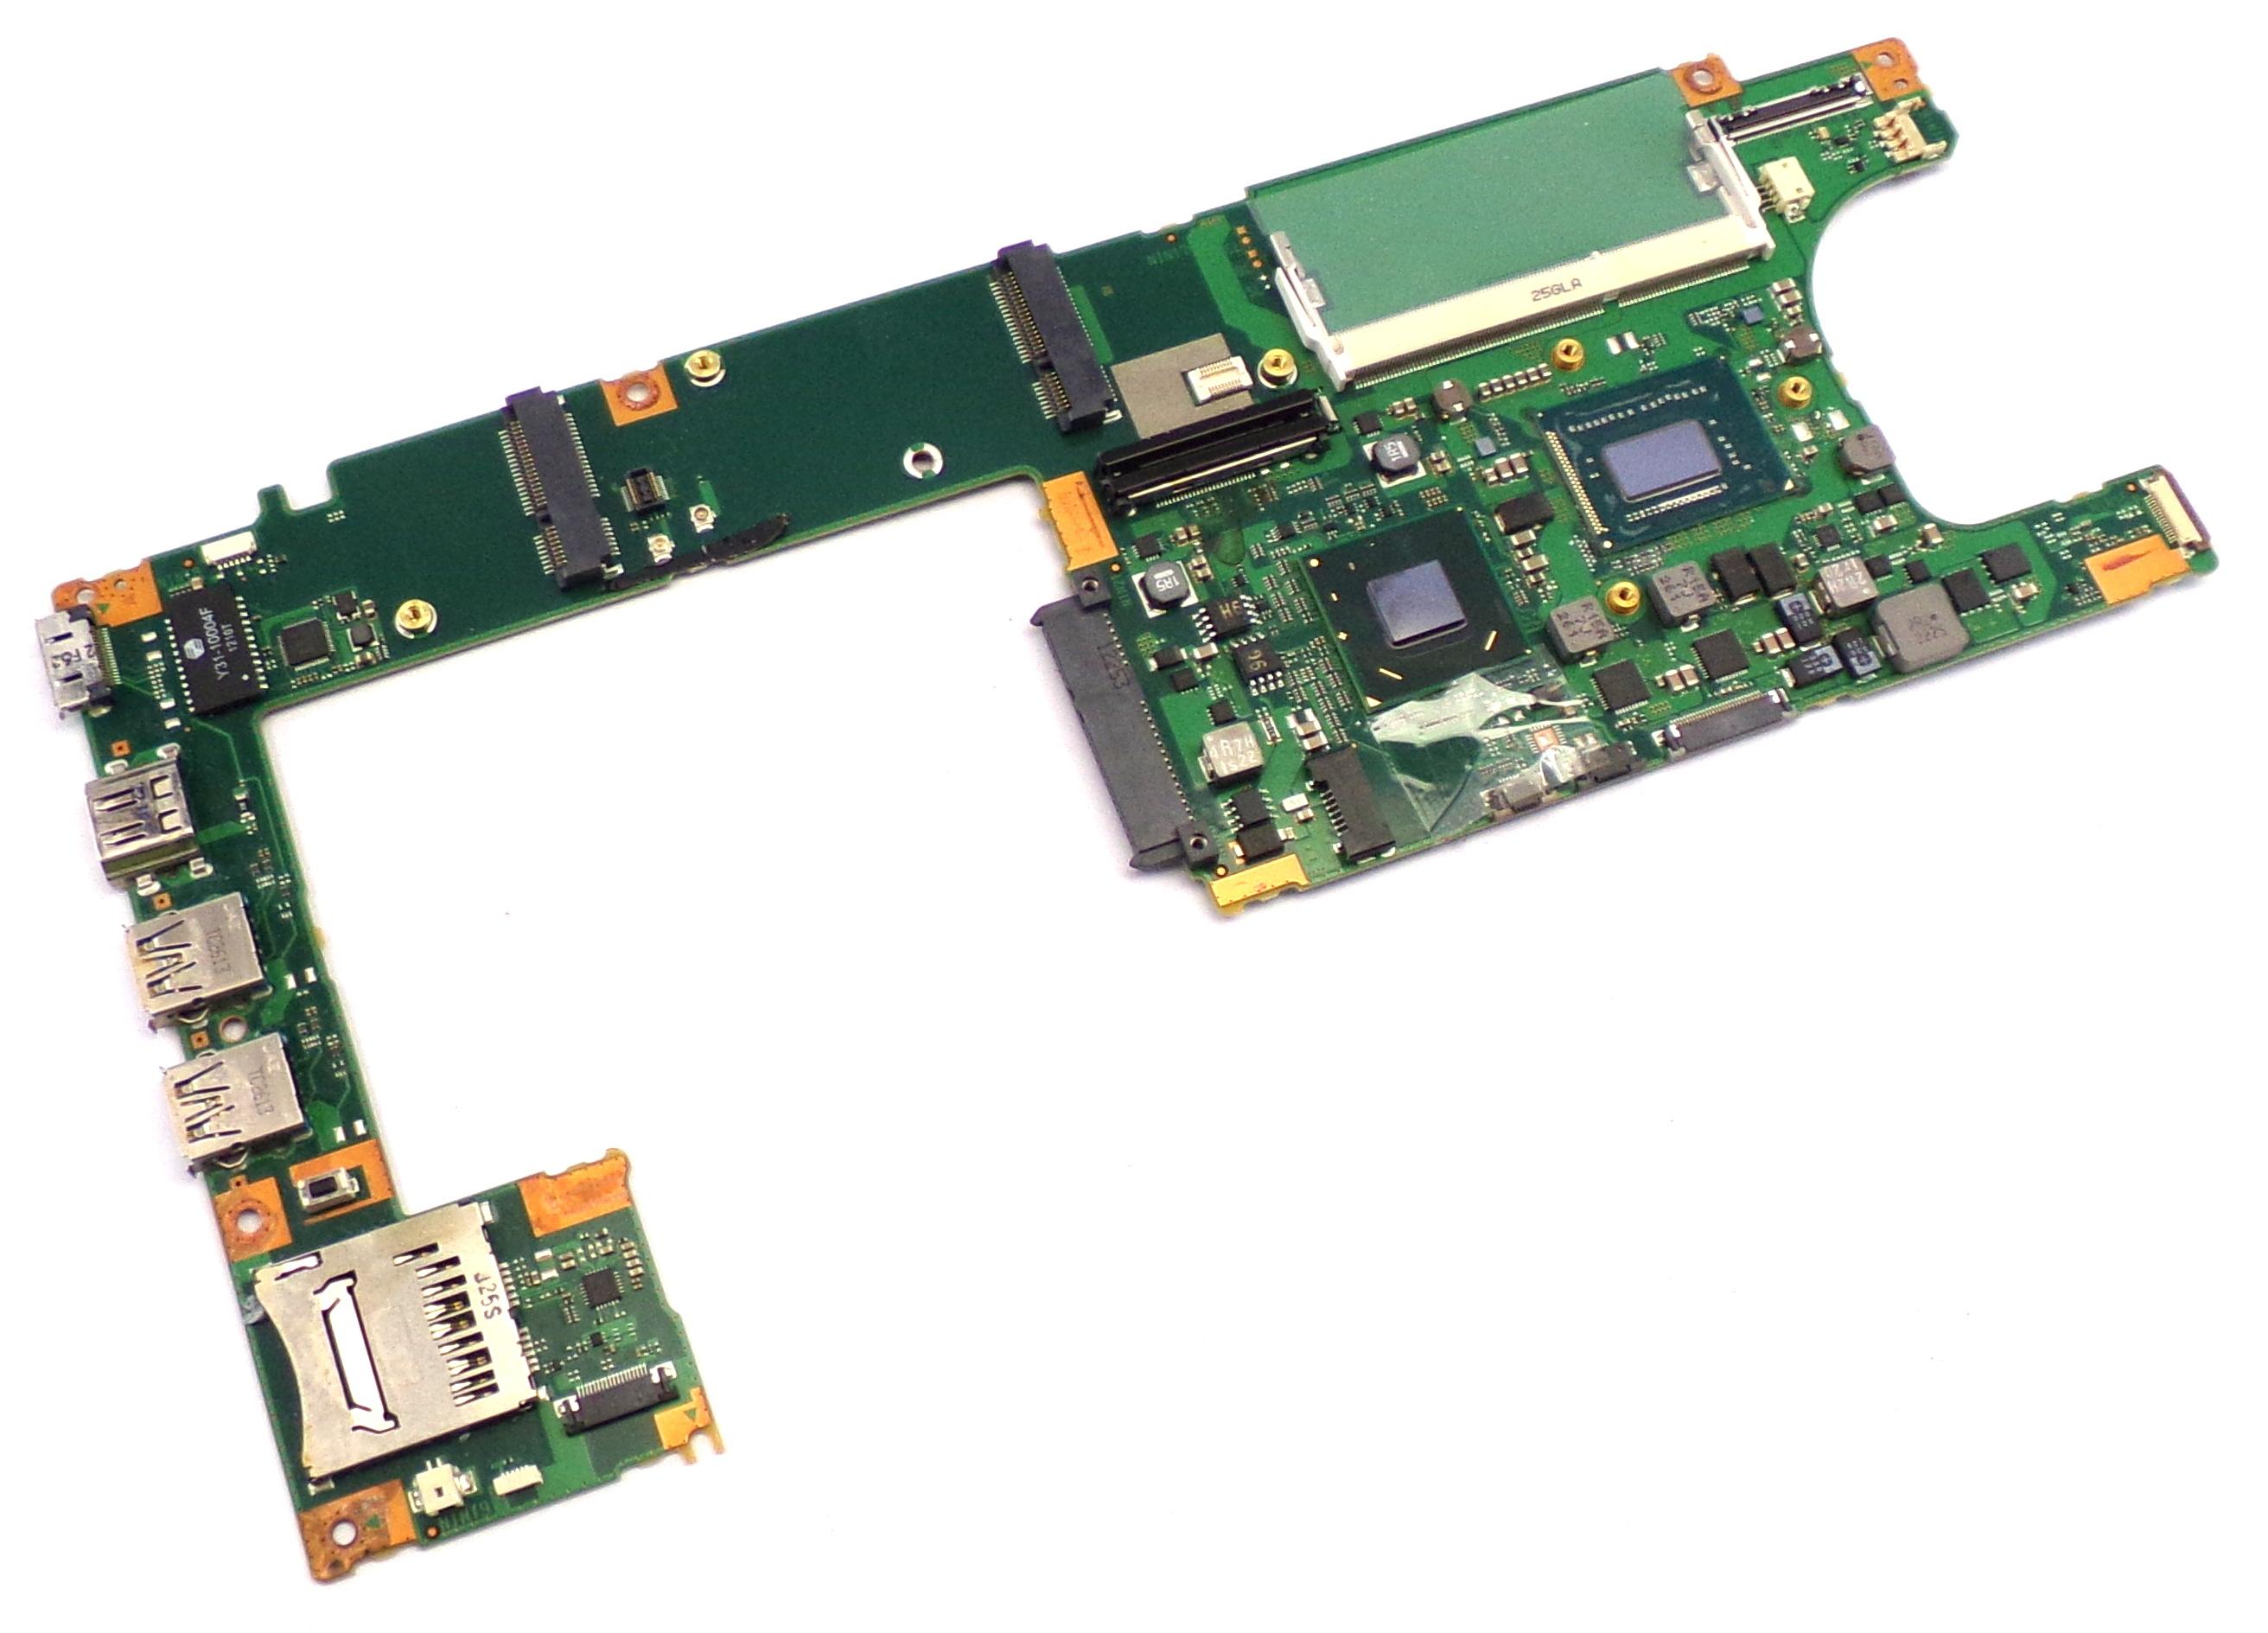 Fujitsu CP567110-Z3 LifeBook U772 Motherboard with i5-3317U Processor